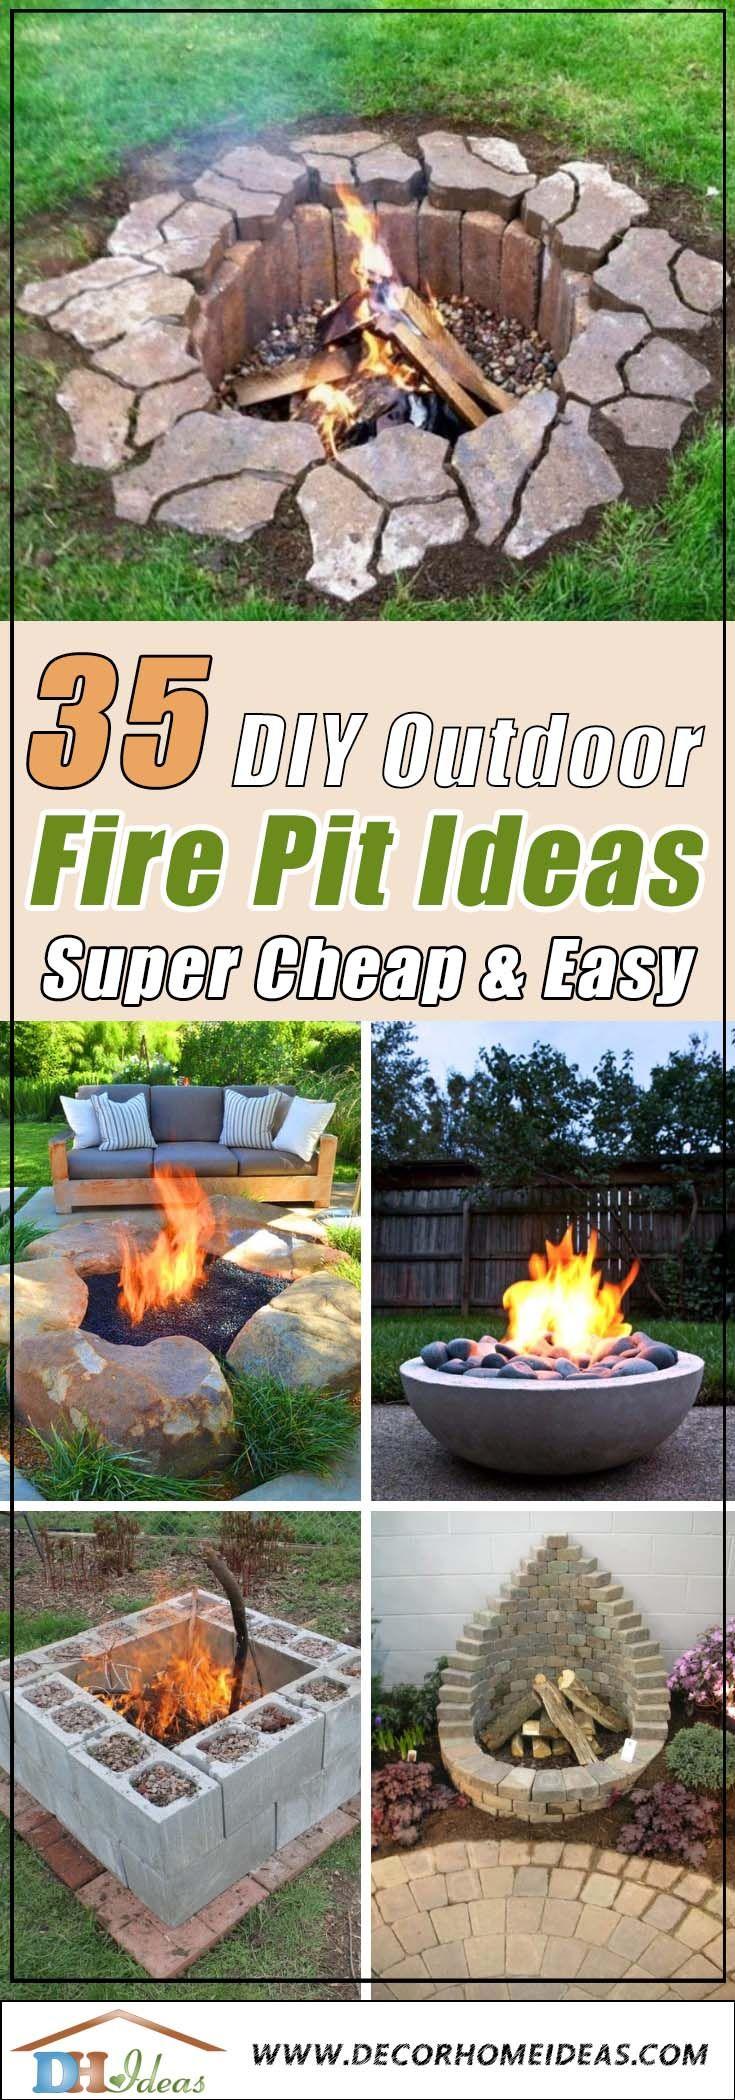 35 Best DIY Outdoor Fire Pit Ideas [ Super Cheap & Easy